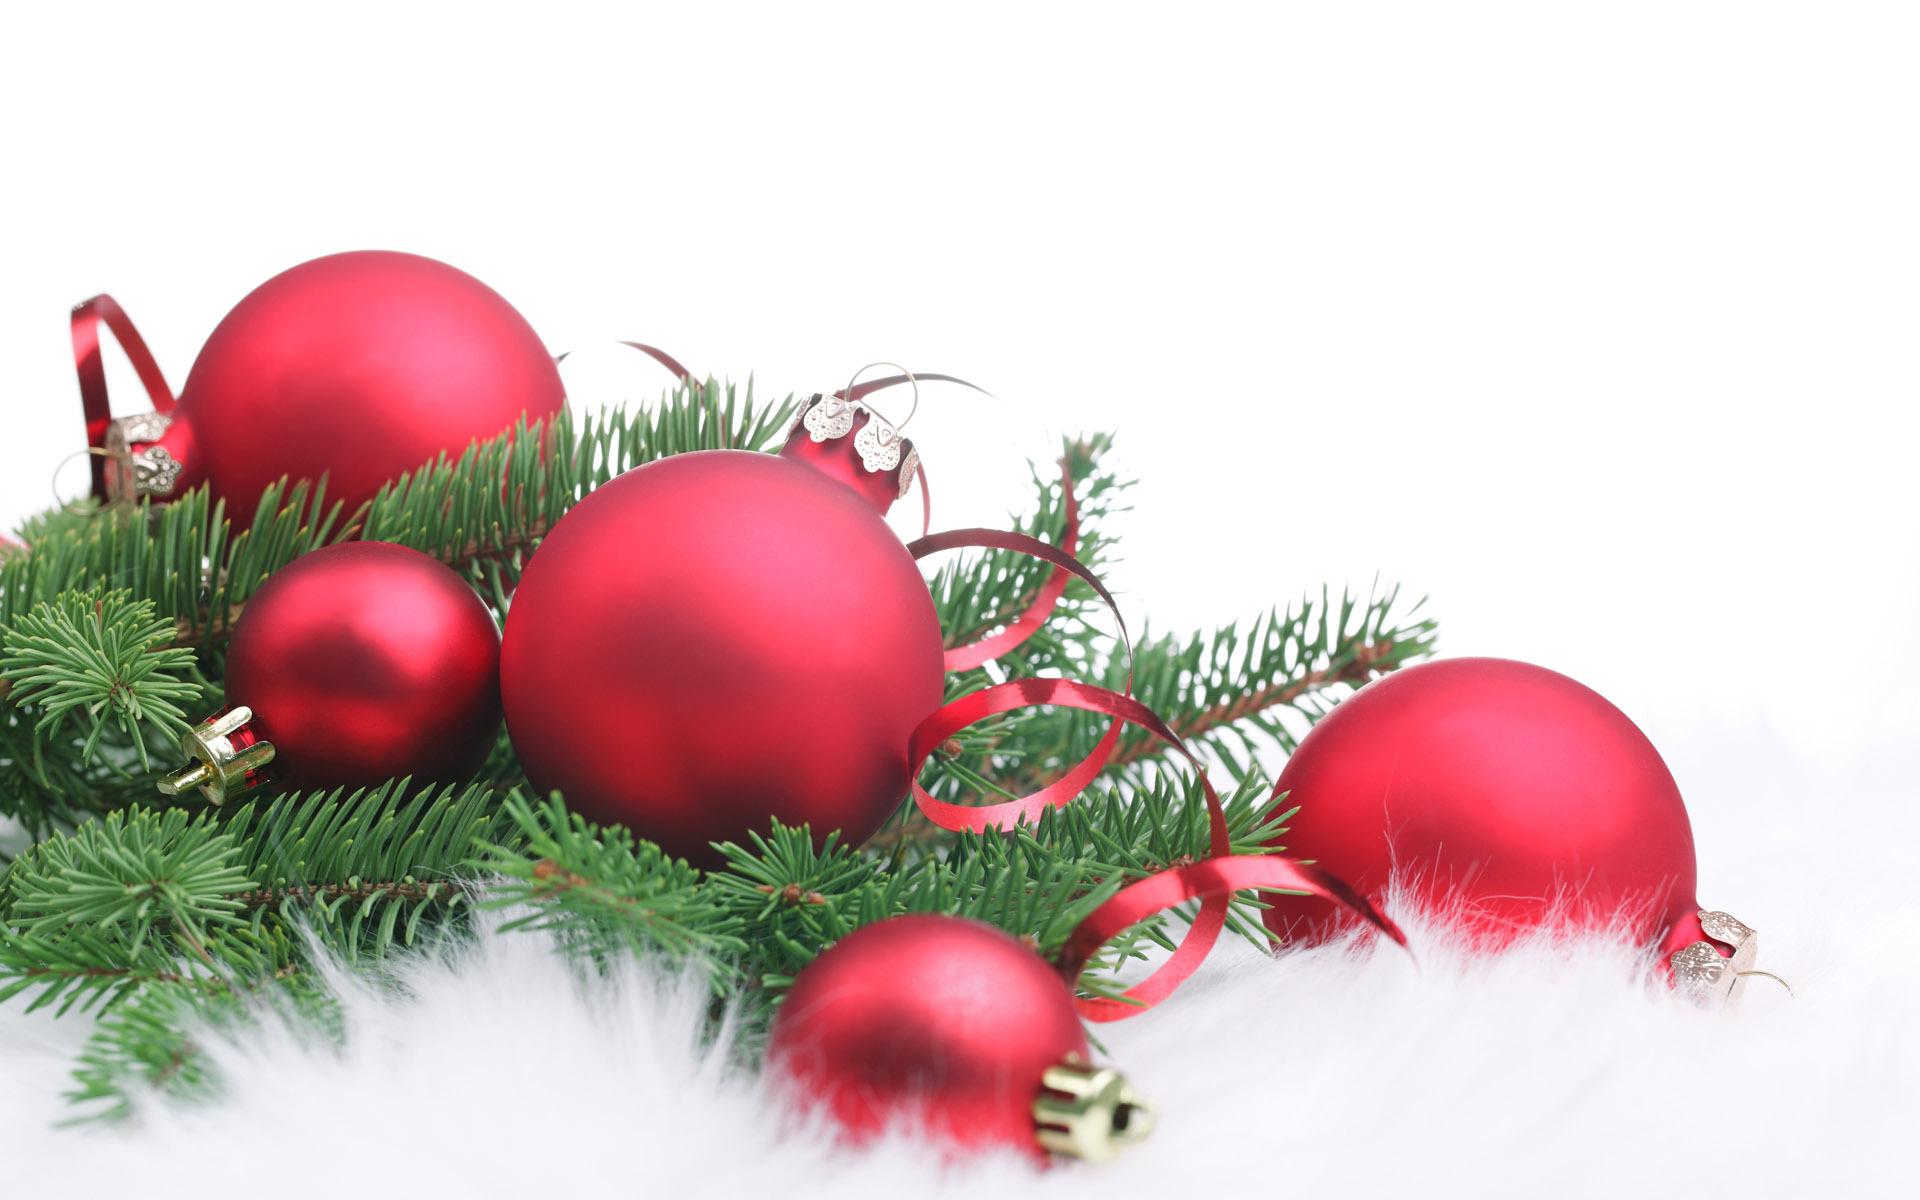 Red-Christmas-decorations-christmas-22228020-1920-1200